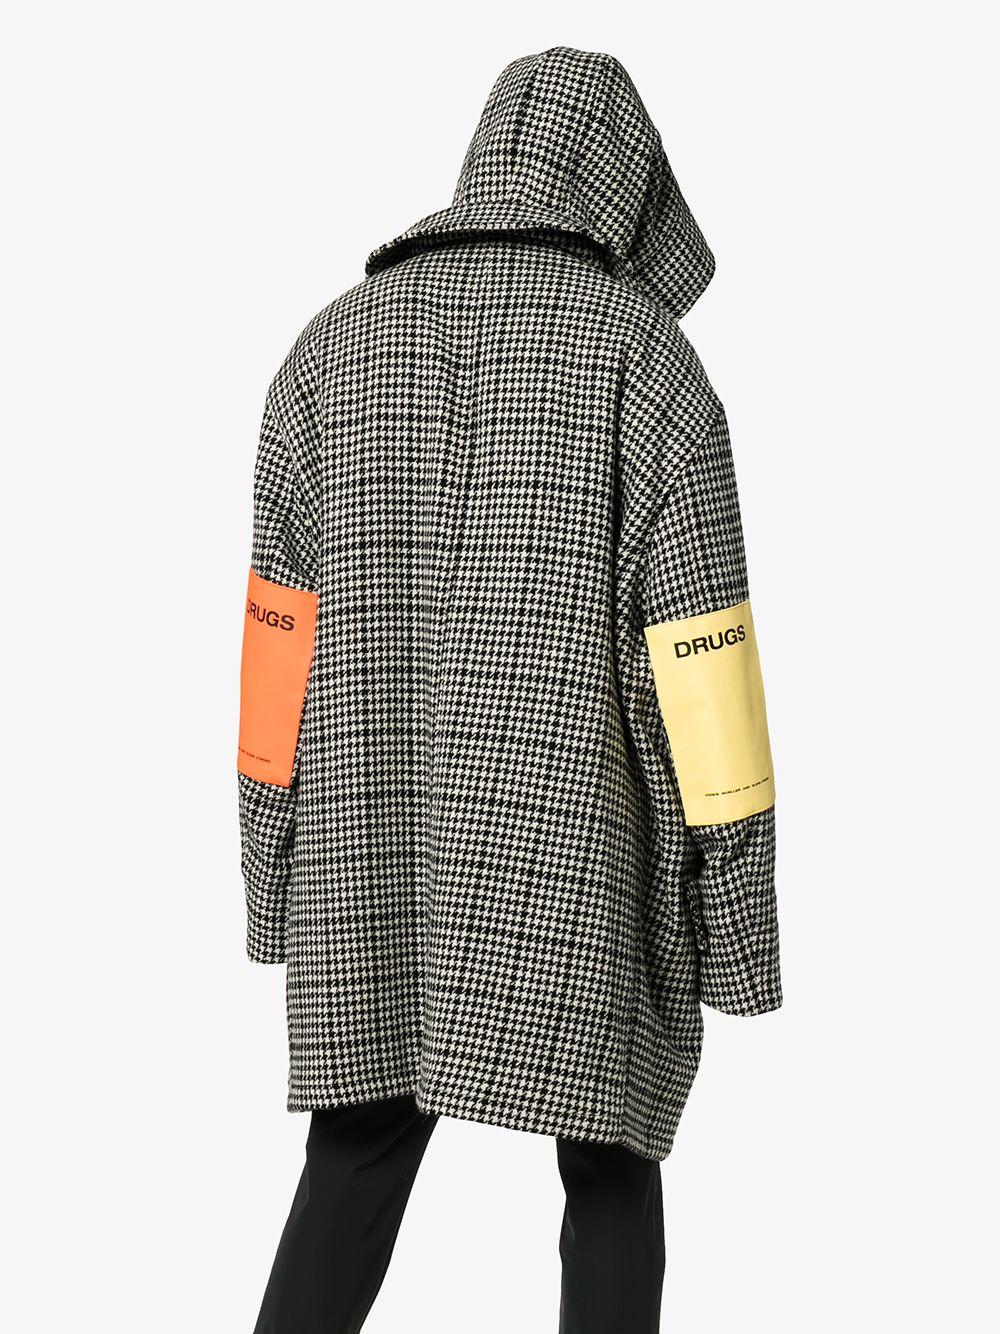 raf-simons-houndstooth-padded-parka-coat_13089235_15286299_1000